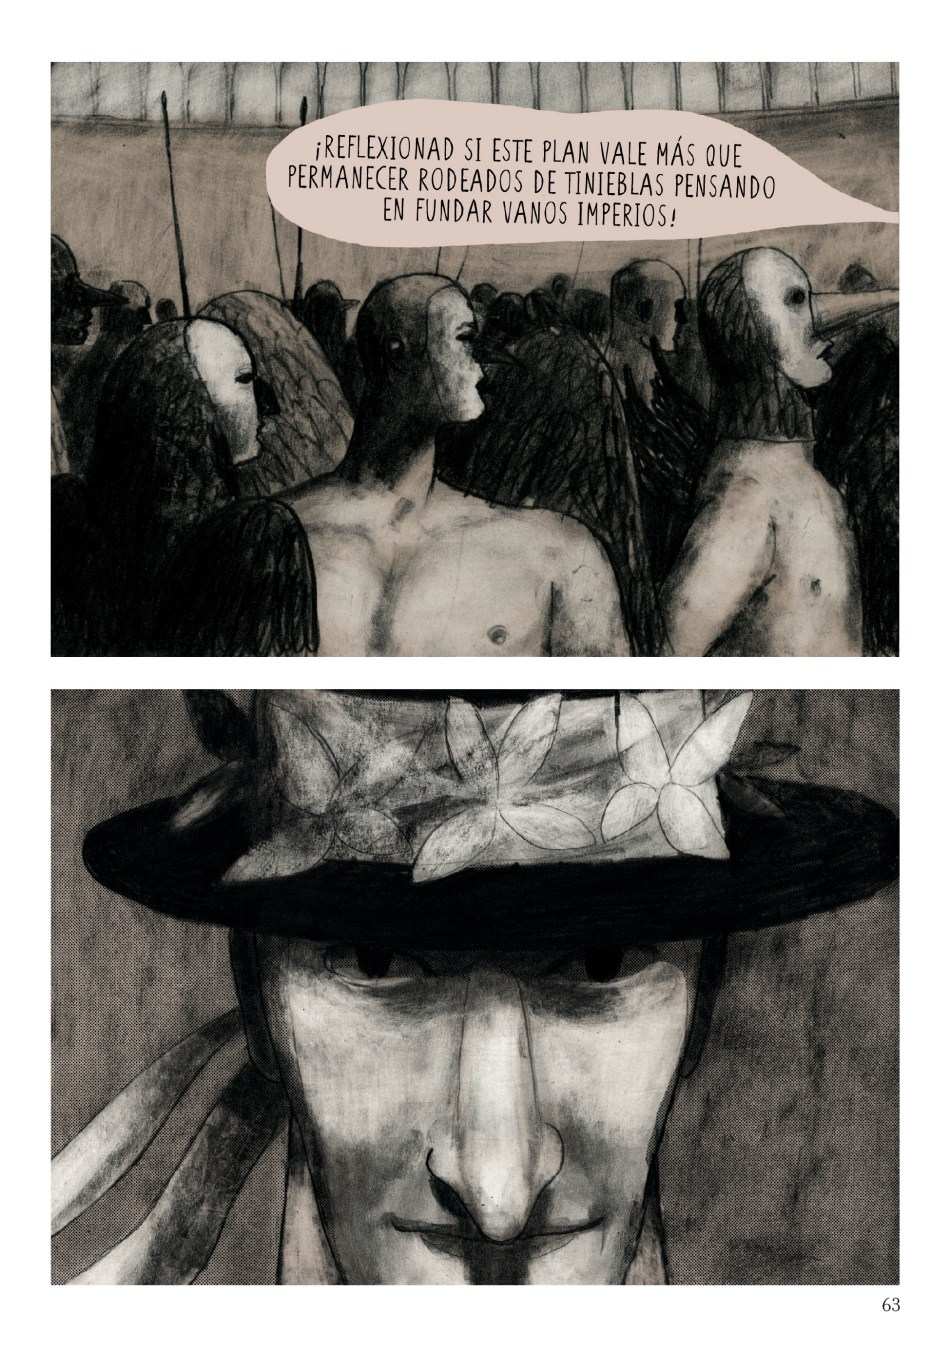 Pages from ParaisoPerdidoALTA-4